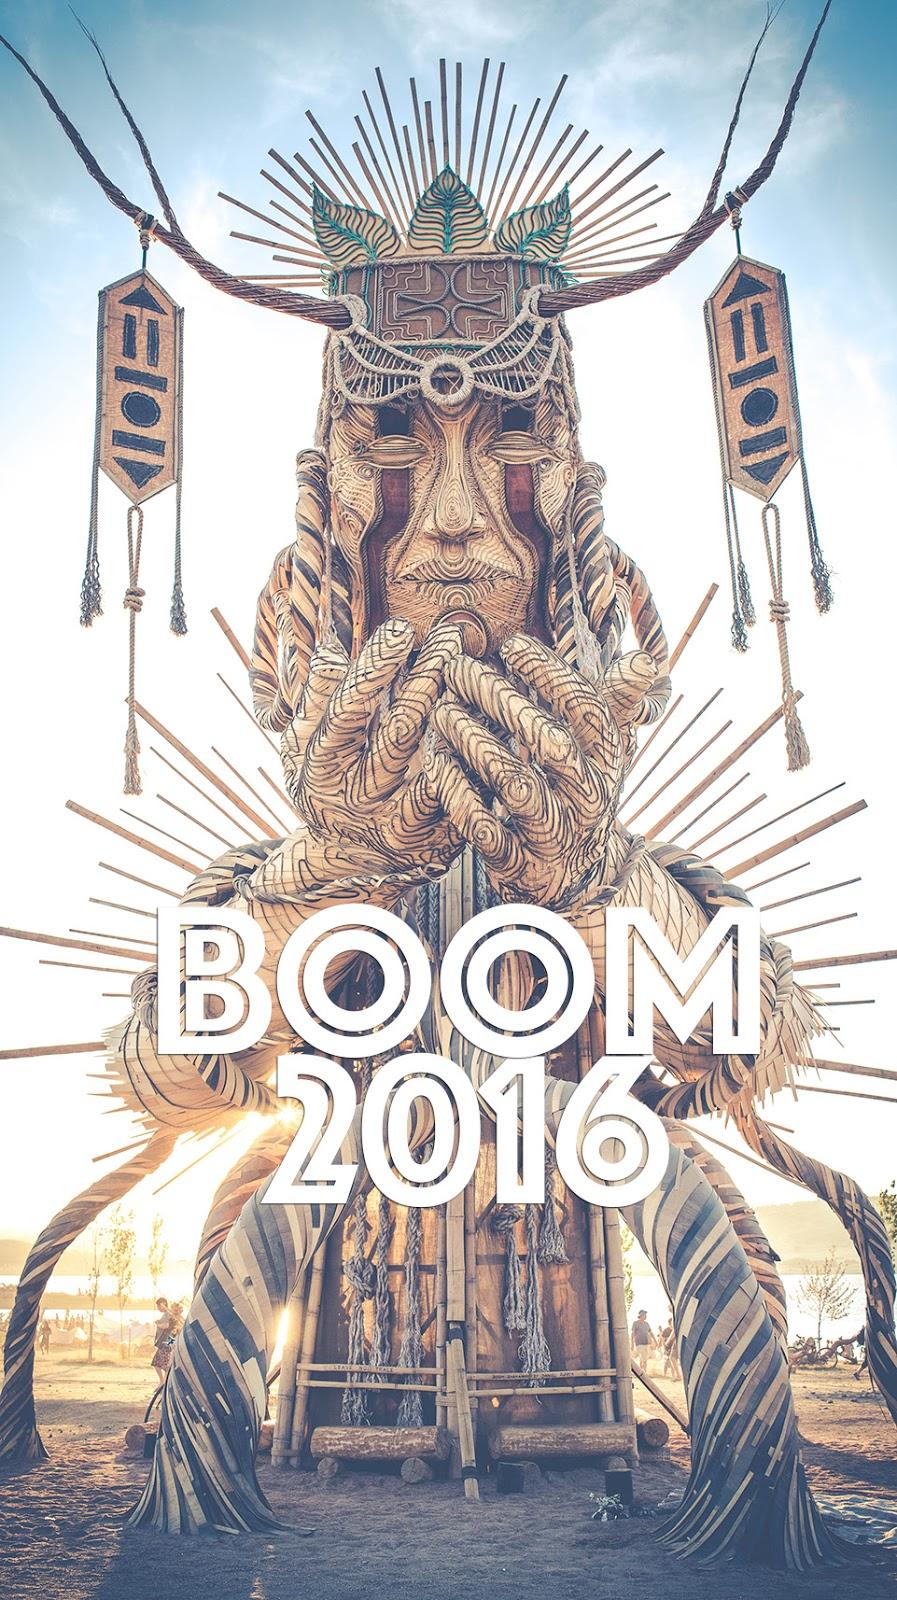 BOOM FESTIVAL 2016 Photos